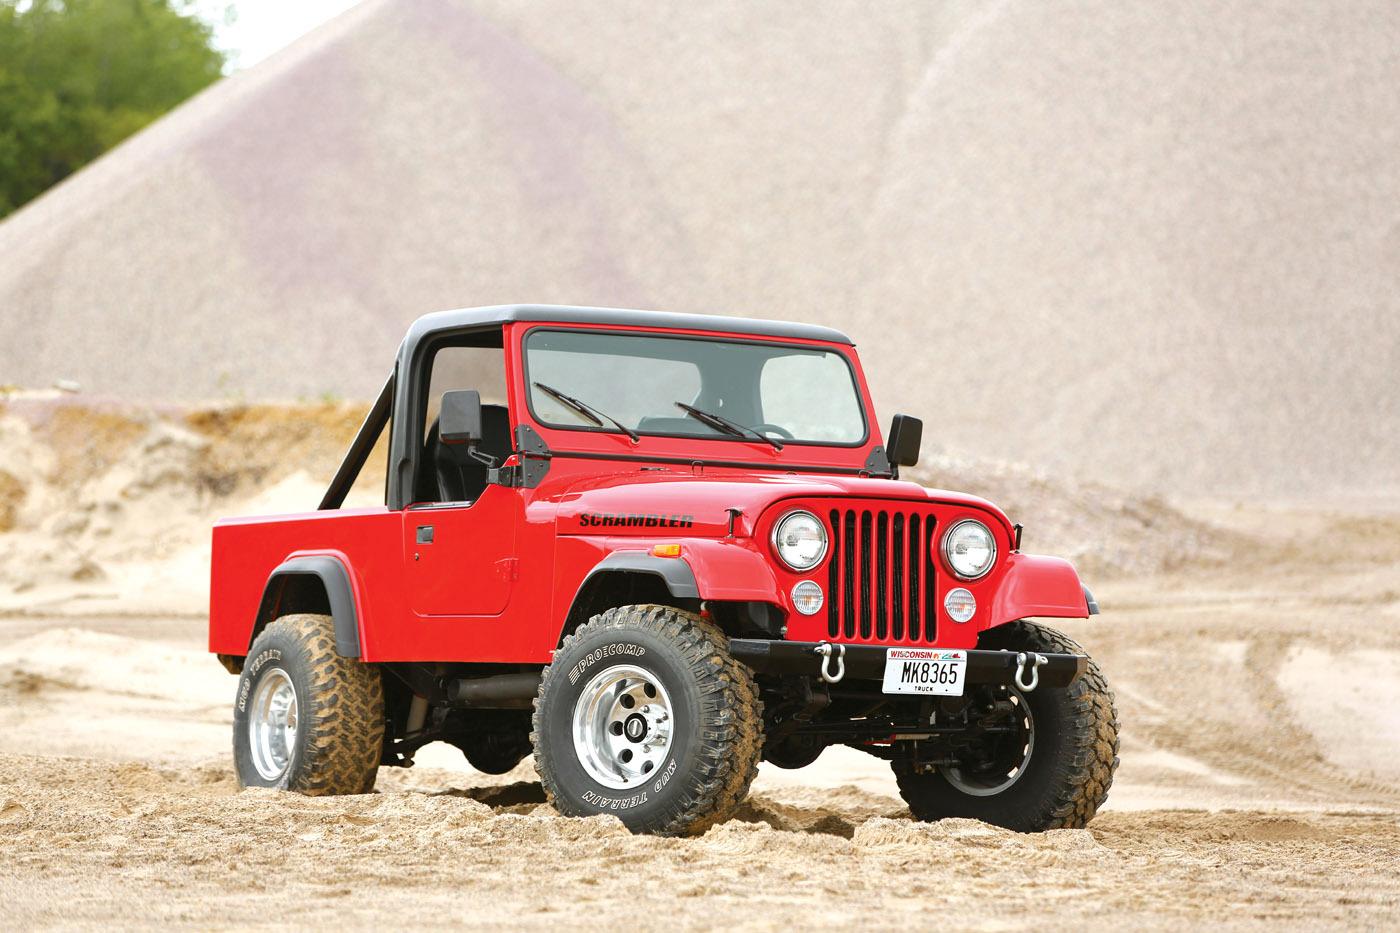 Shell Valley Cj 8 Jeep Scrambler Reincarnation Magazine